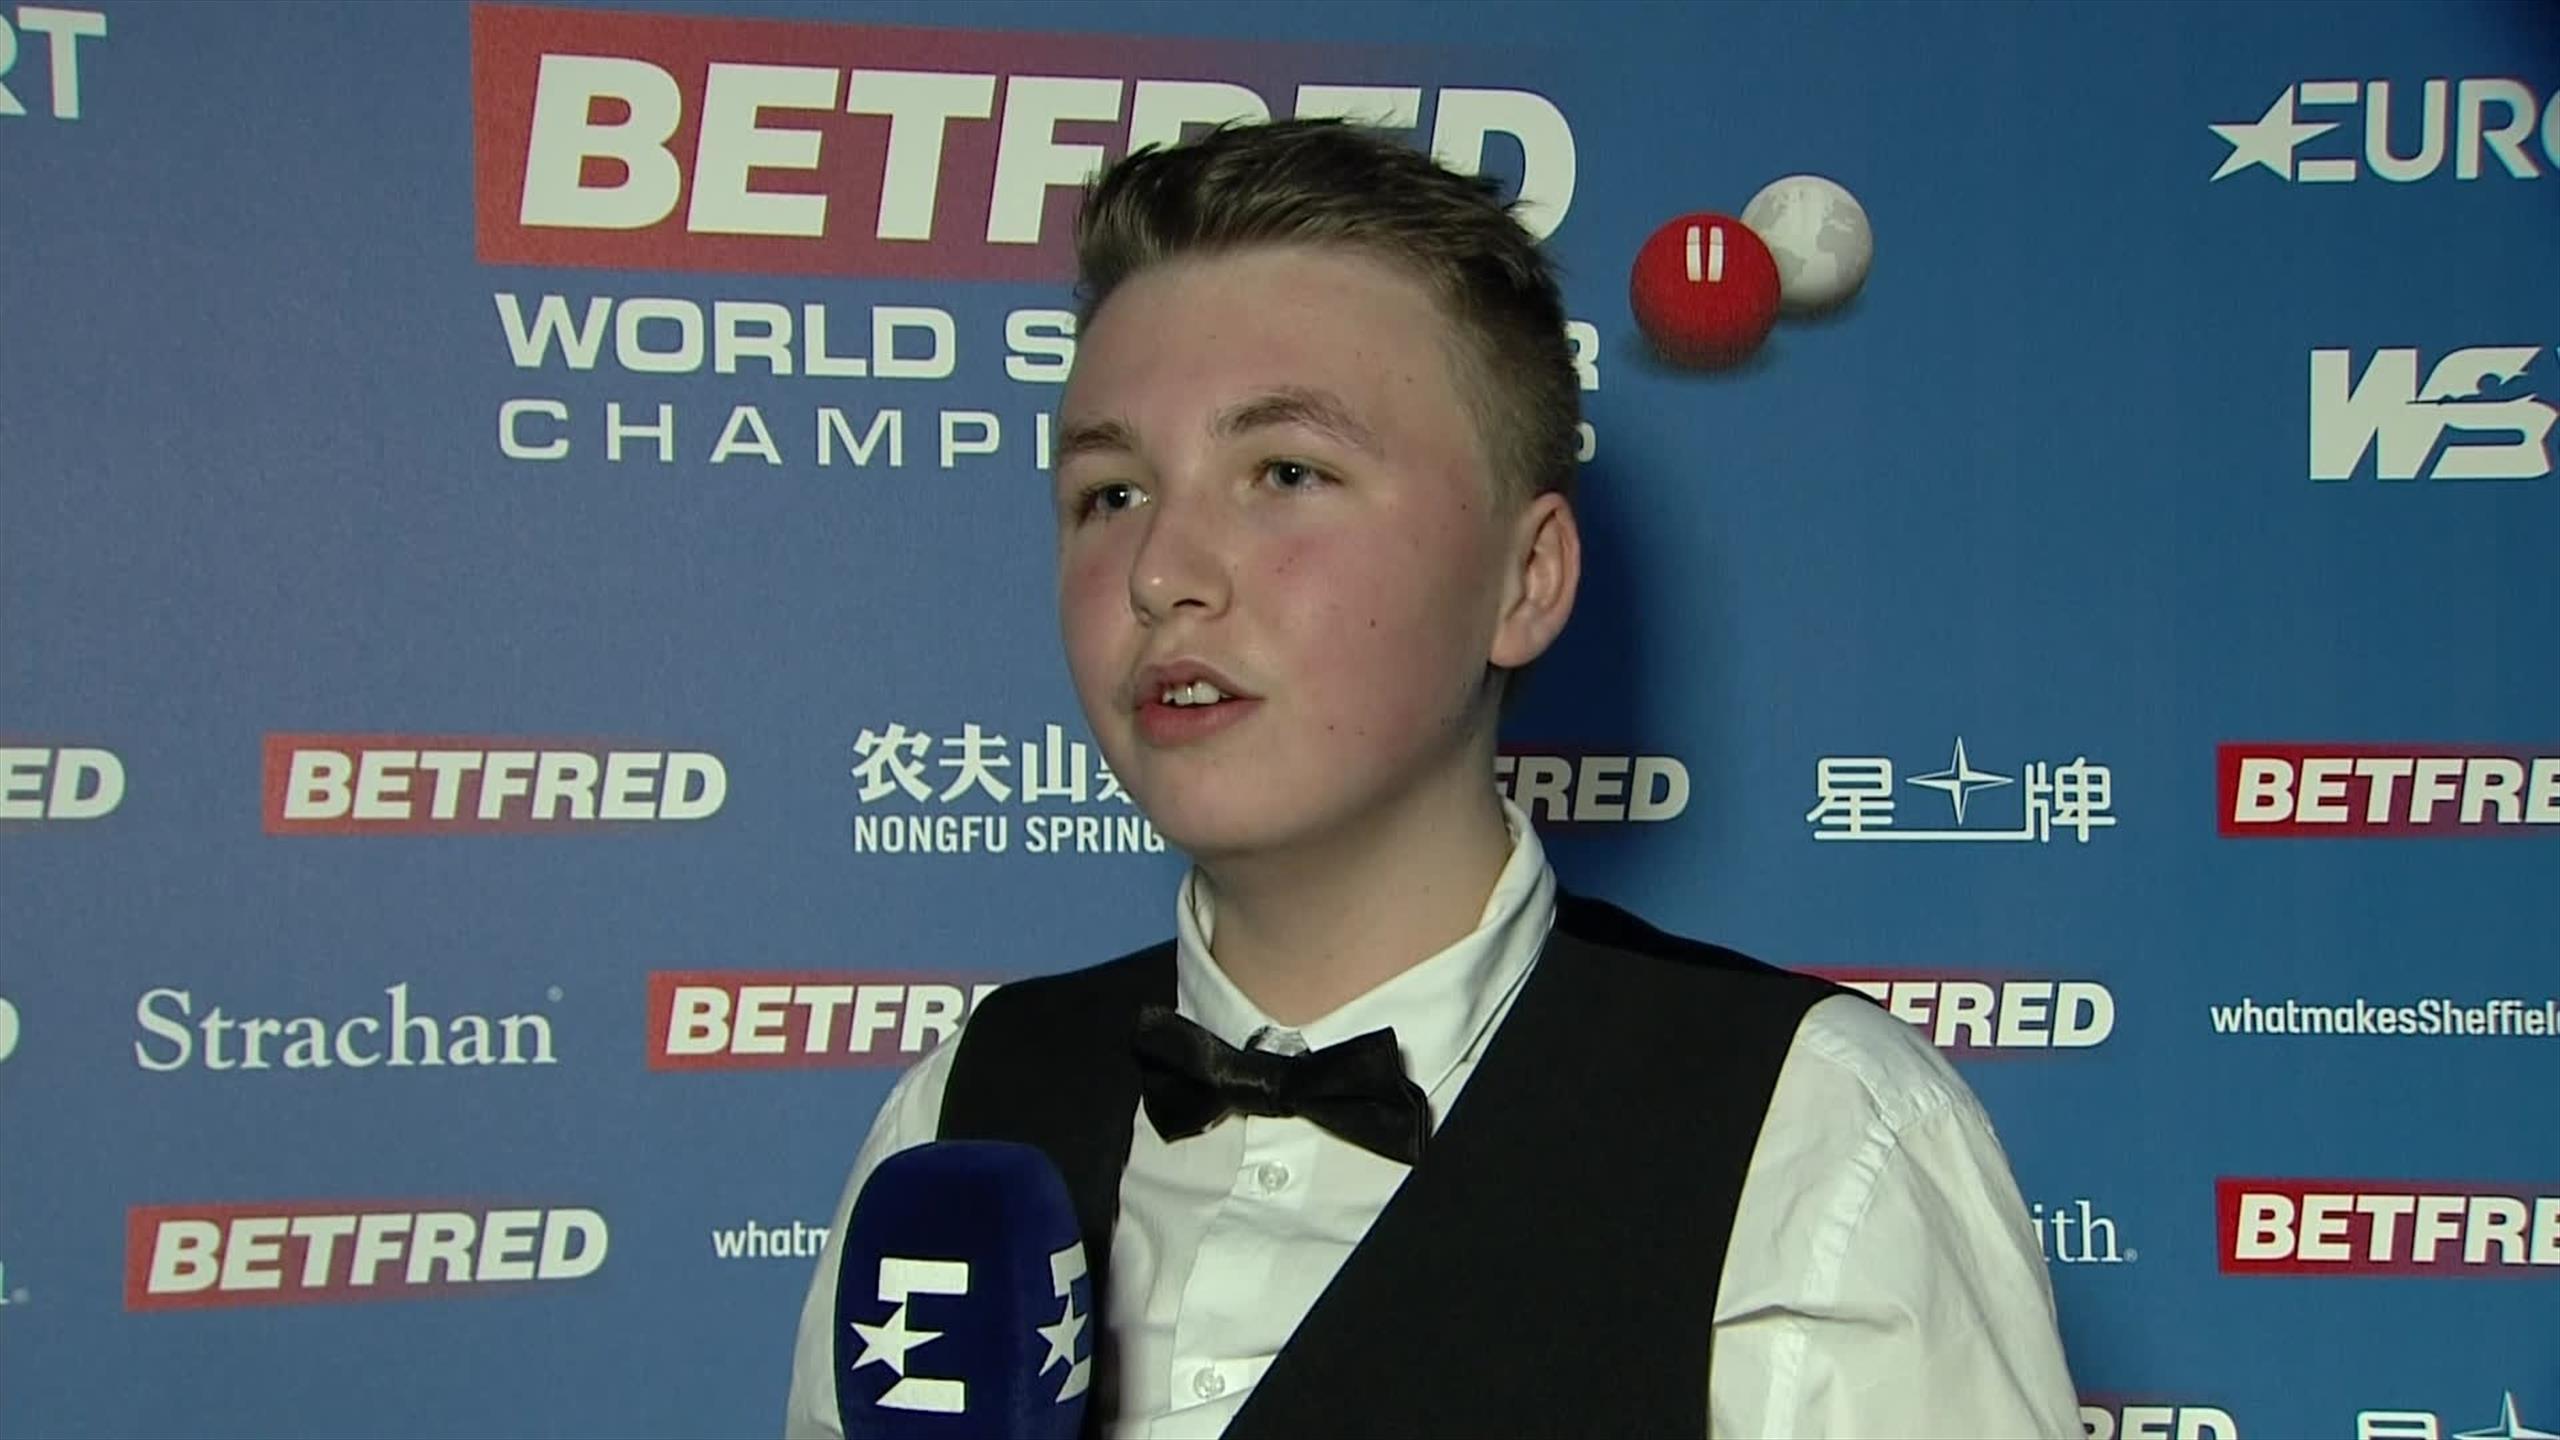 Snooker Wm 2020 Sheffield